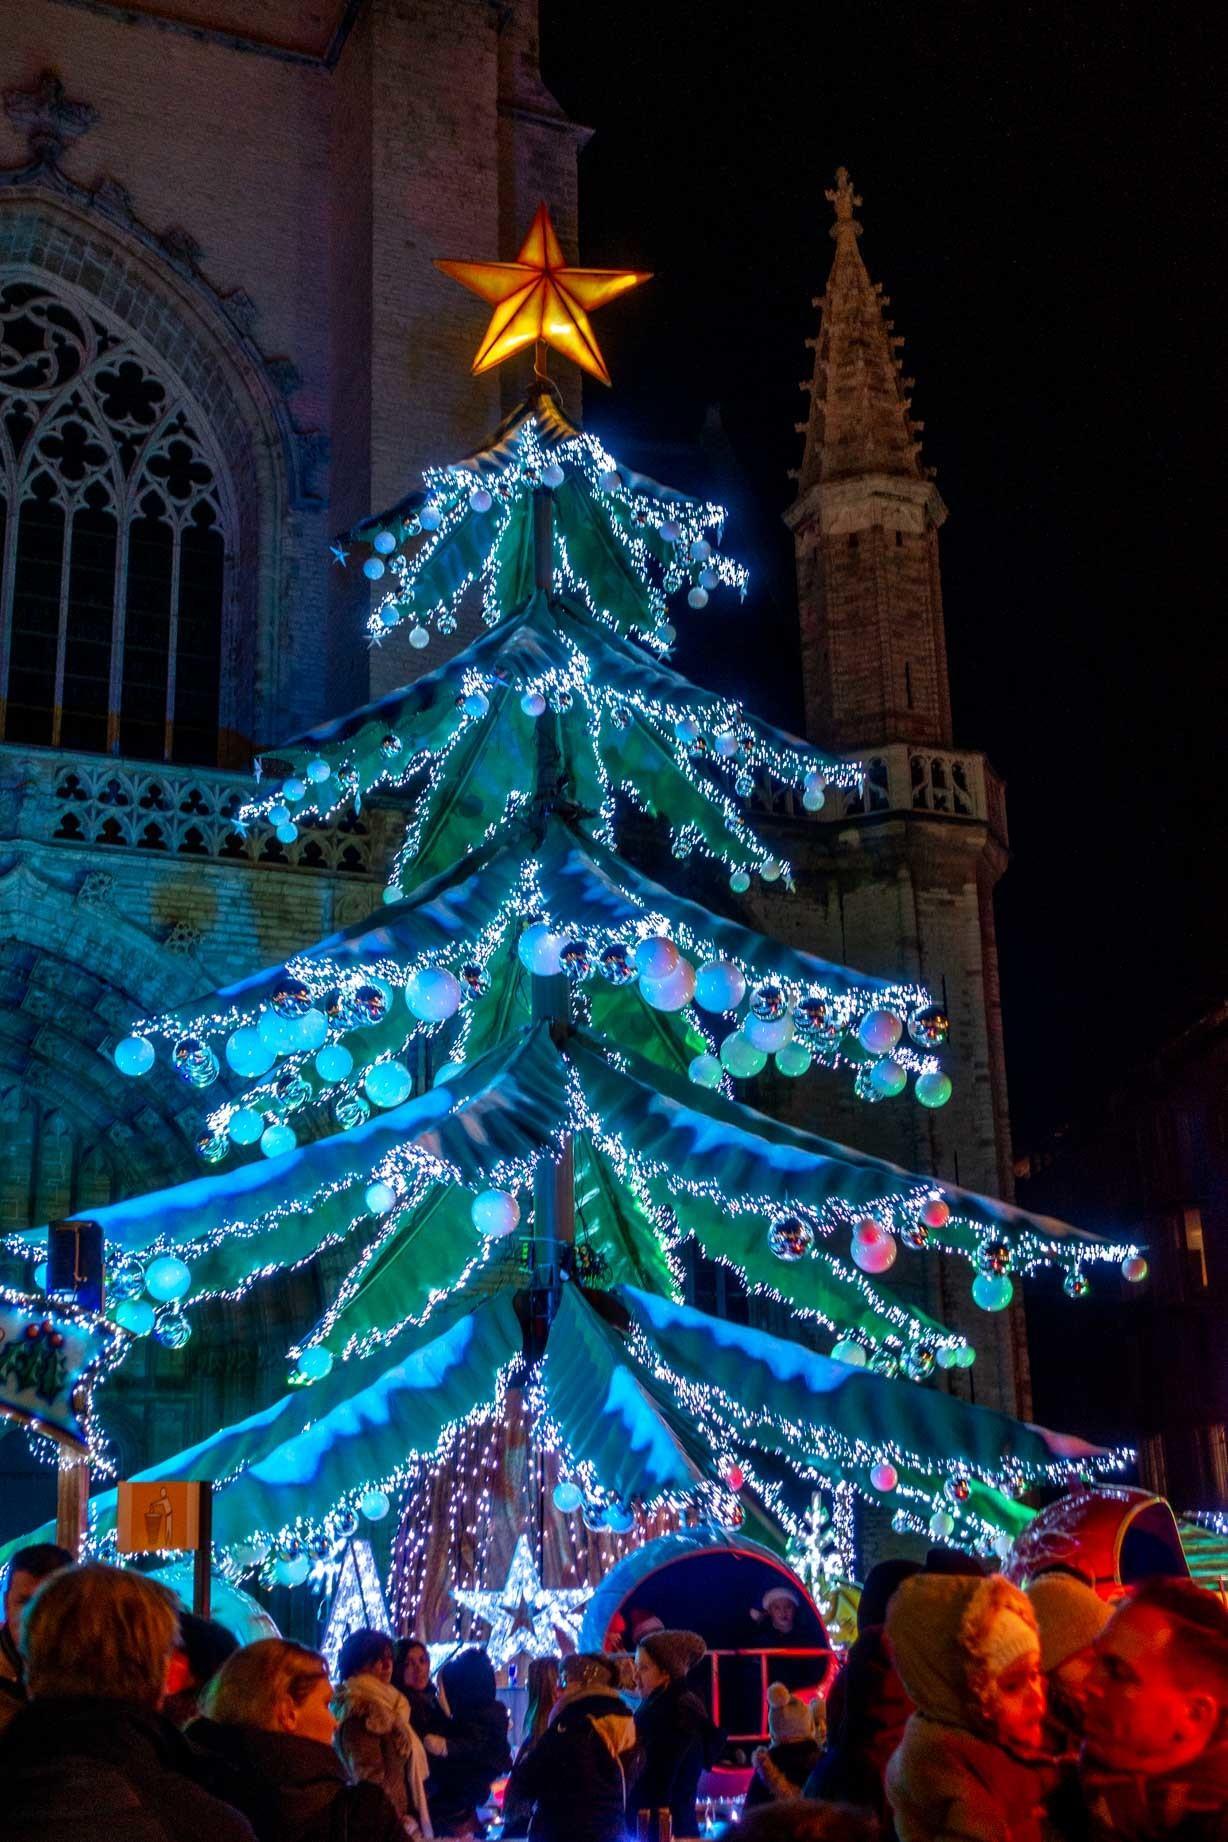 Christmas tree-shaped carnival ride